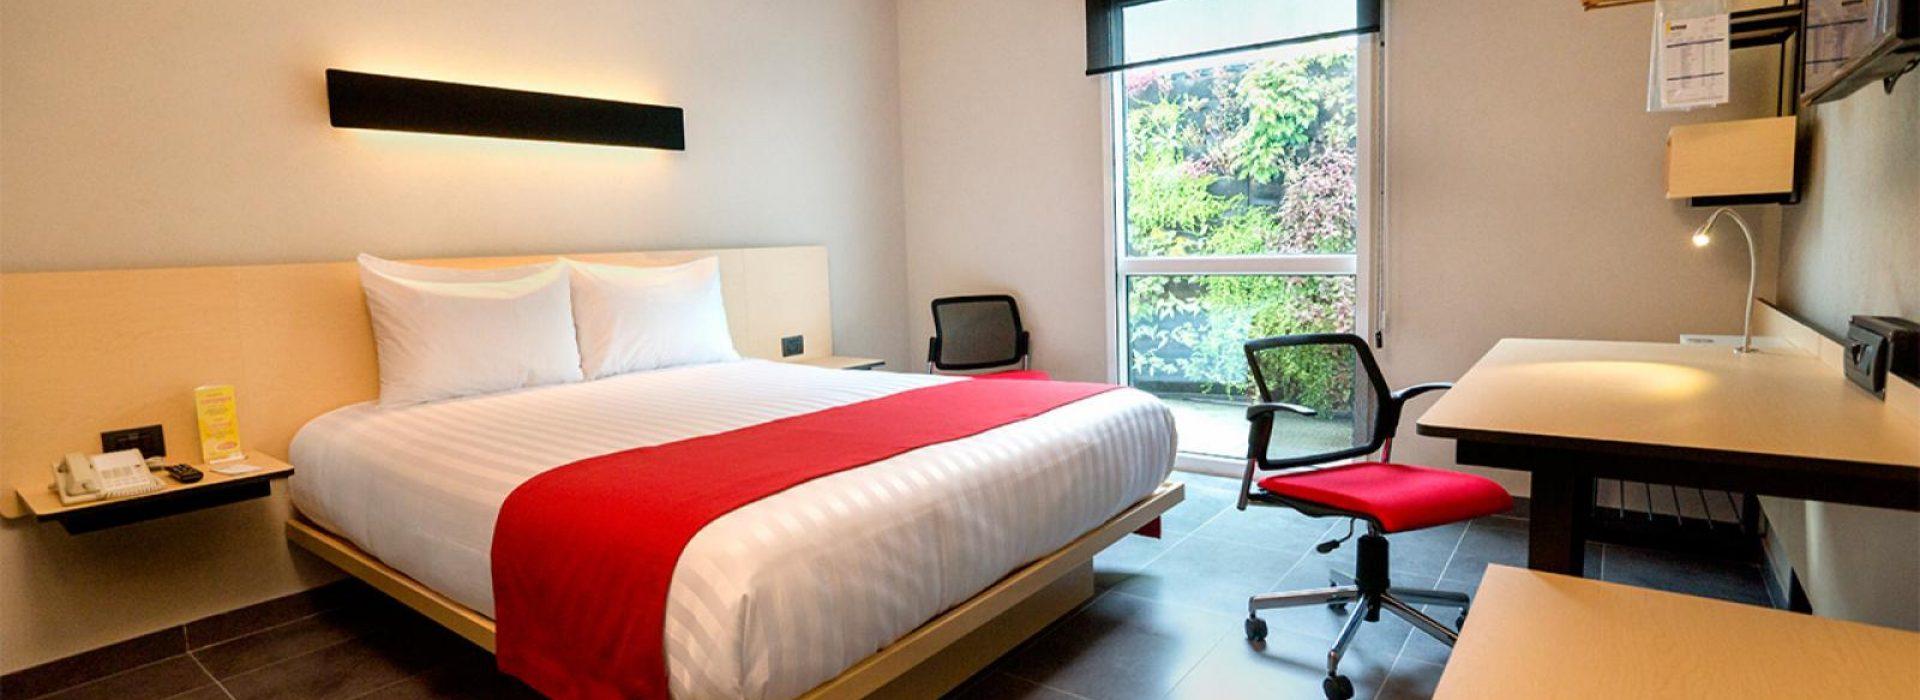 hotel-cali-colombia-city-express-plus-habitacion-sencilla